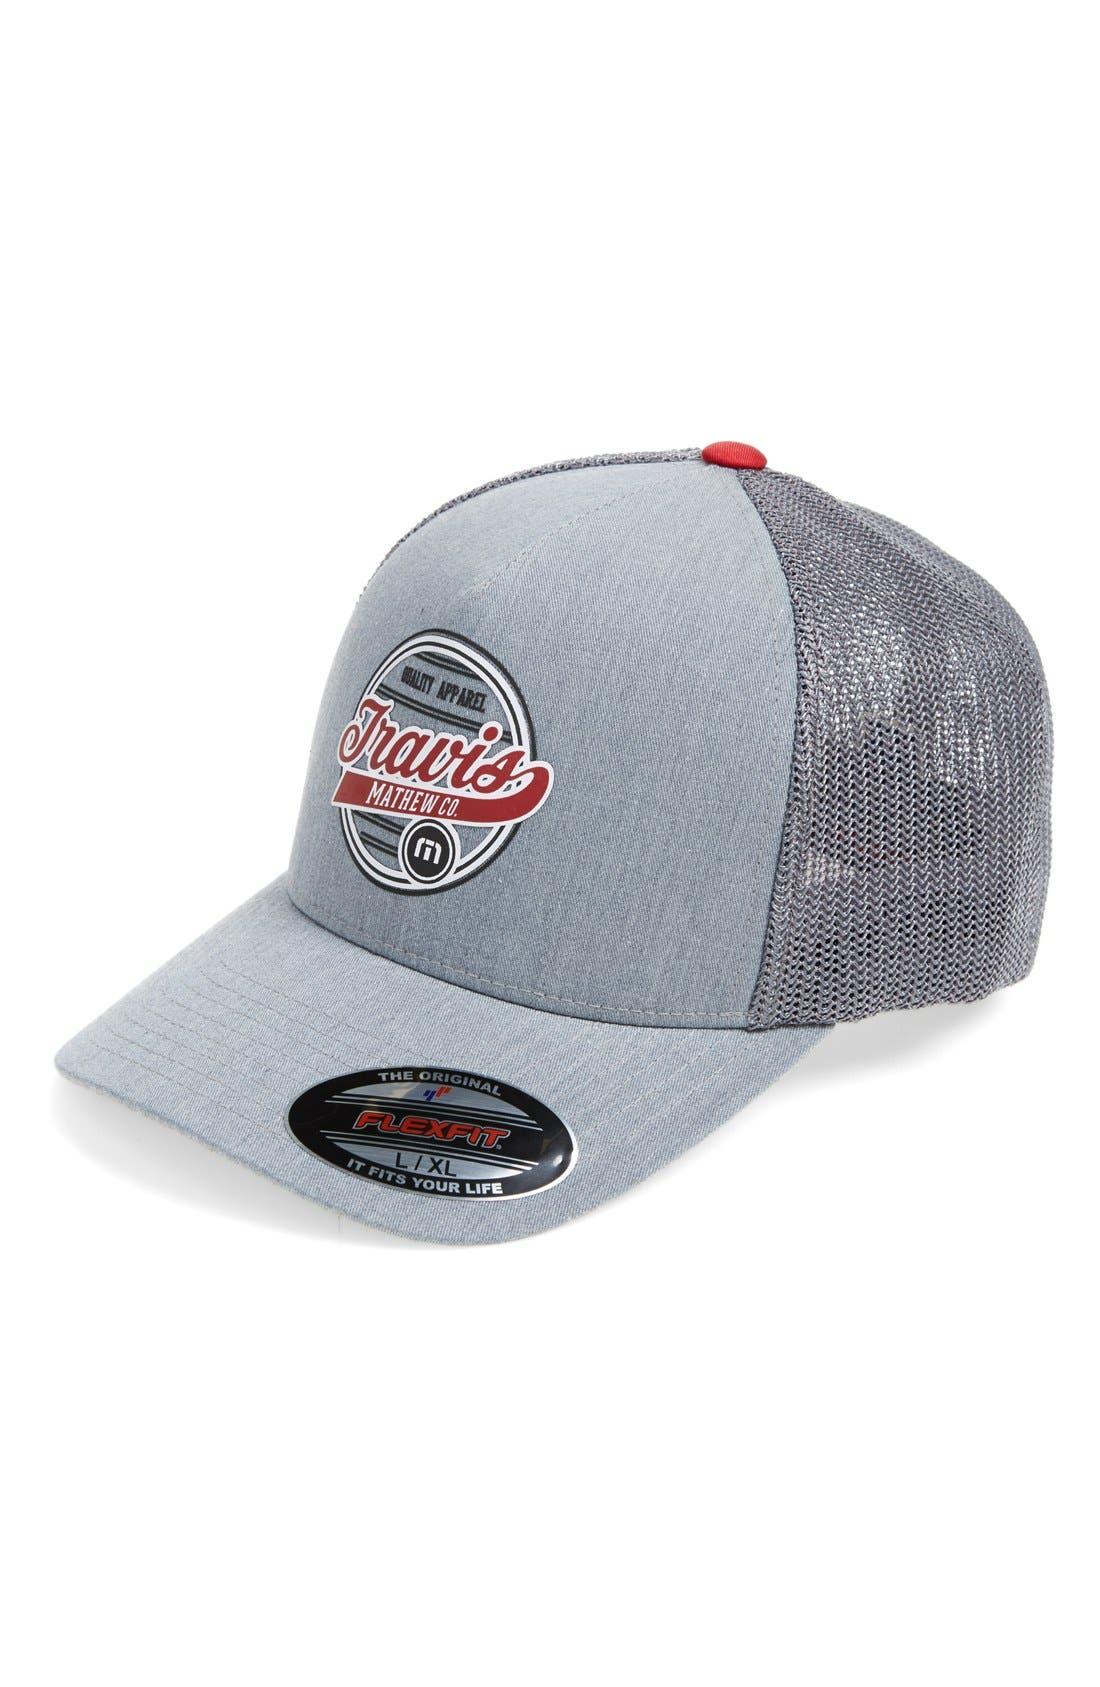 Alternate Image 1 Selected - Travis Mathew 'Cloon' Trucker Hat